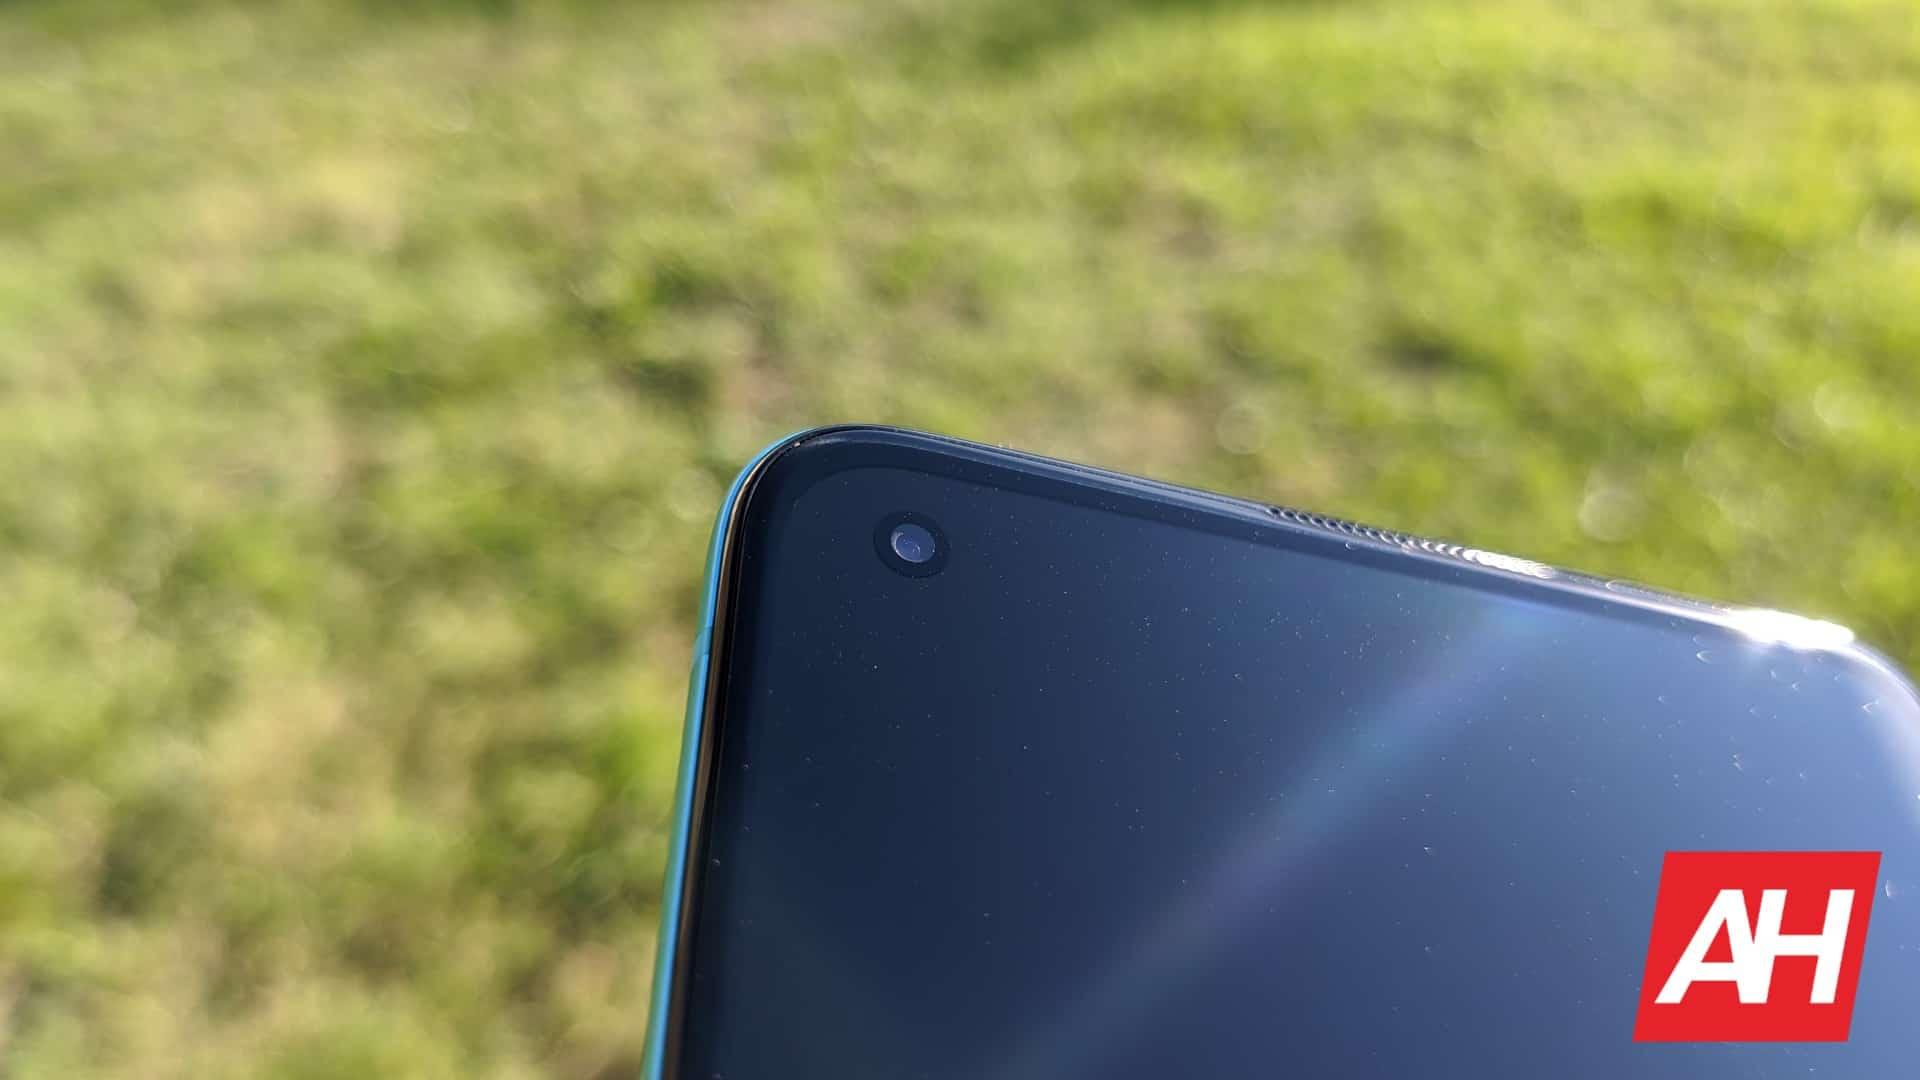 AH OnePlus 8T image 33